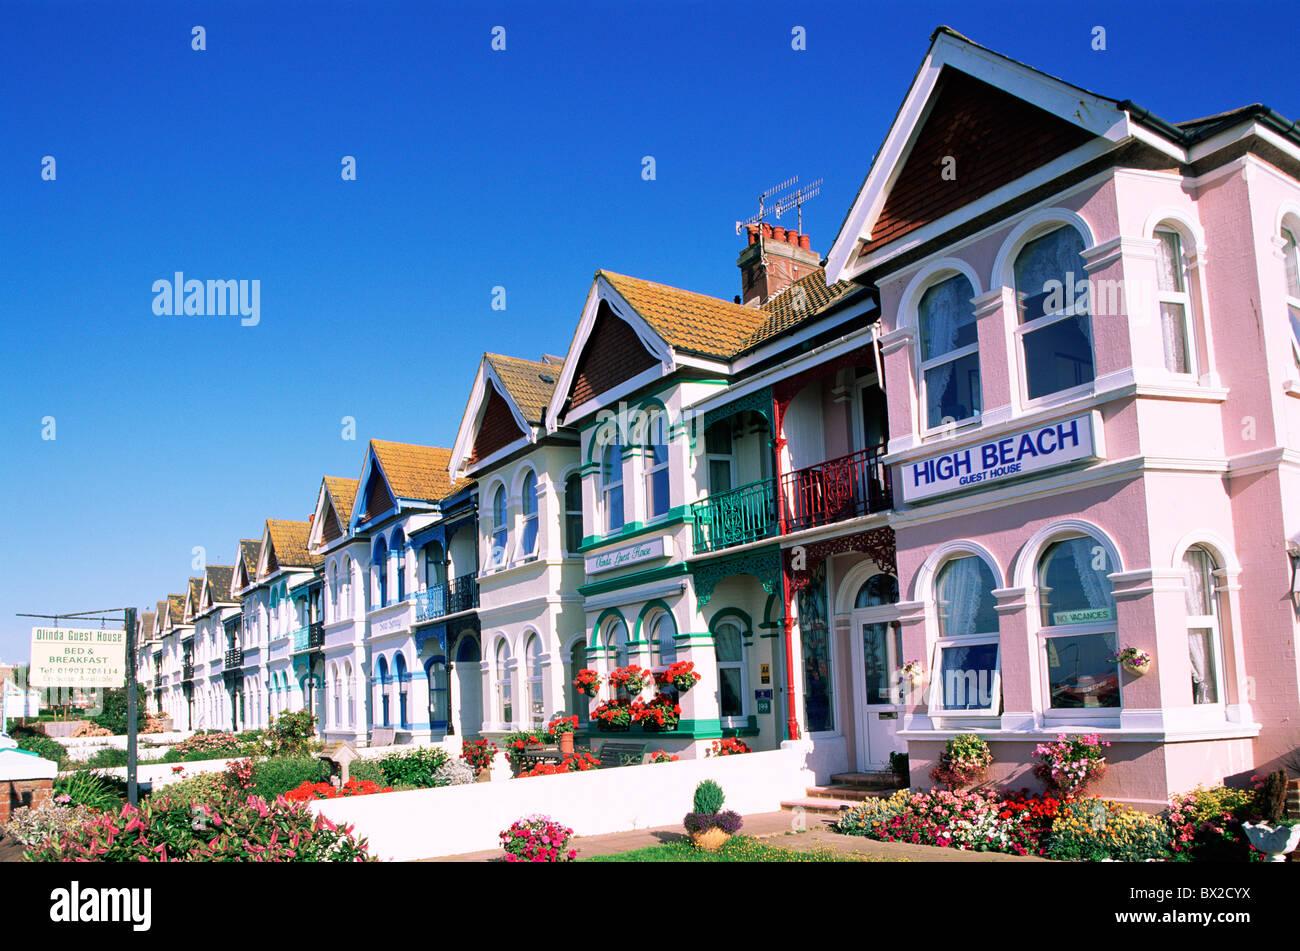 Accomodation B B B B Sign Bed and Breakfast Britain British Isles England Great Britain Europe Holiday H Stock Photo